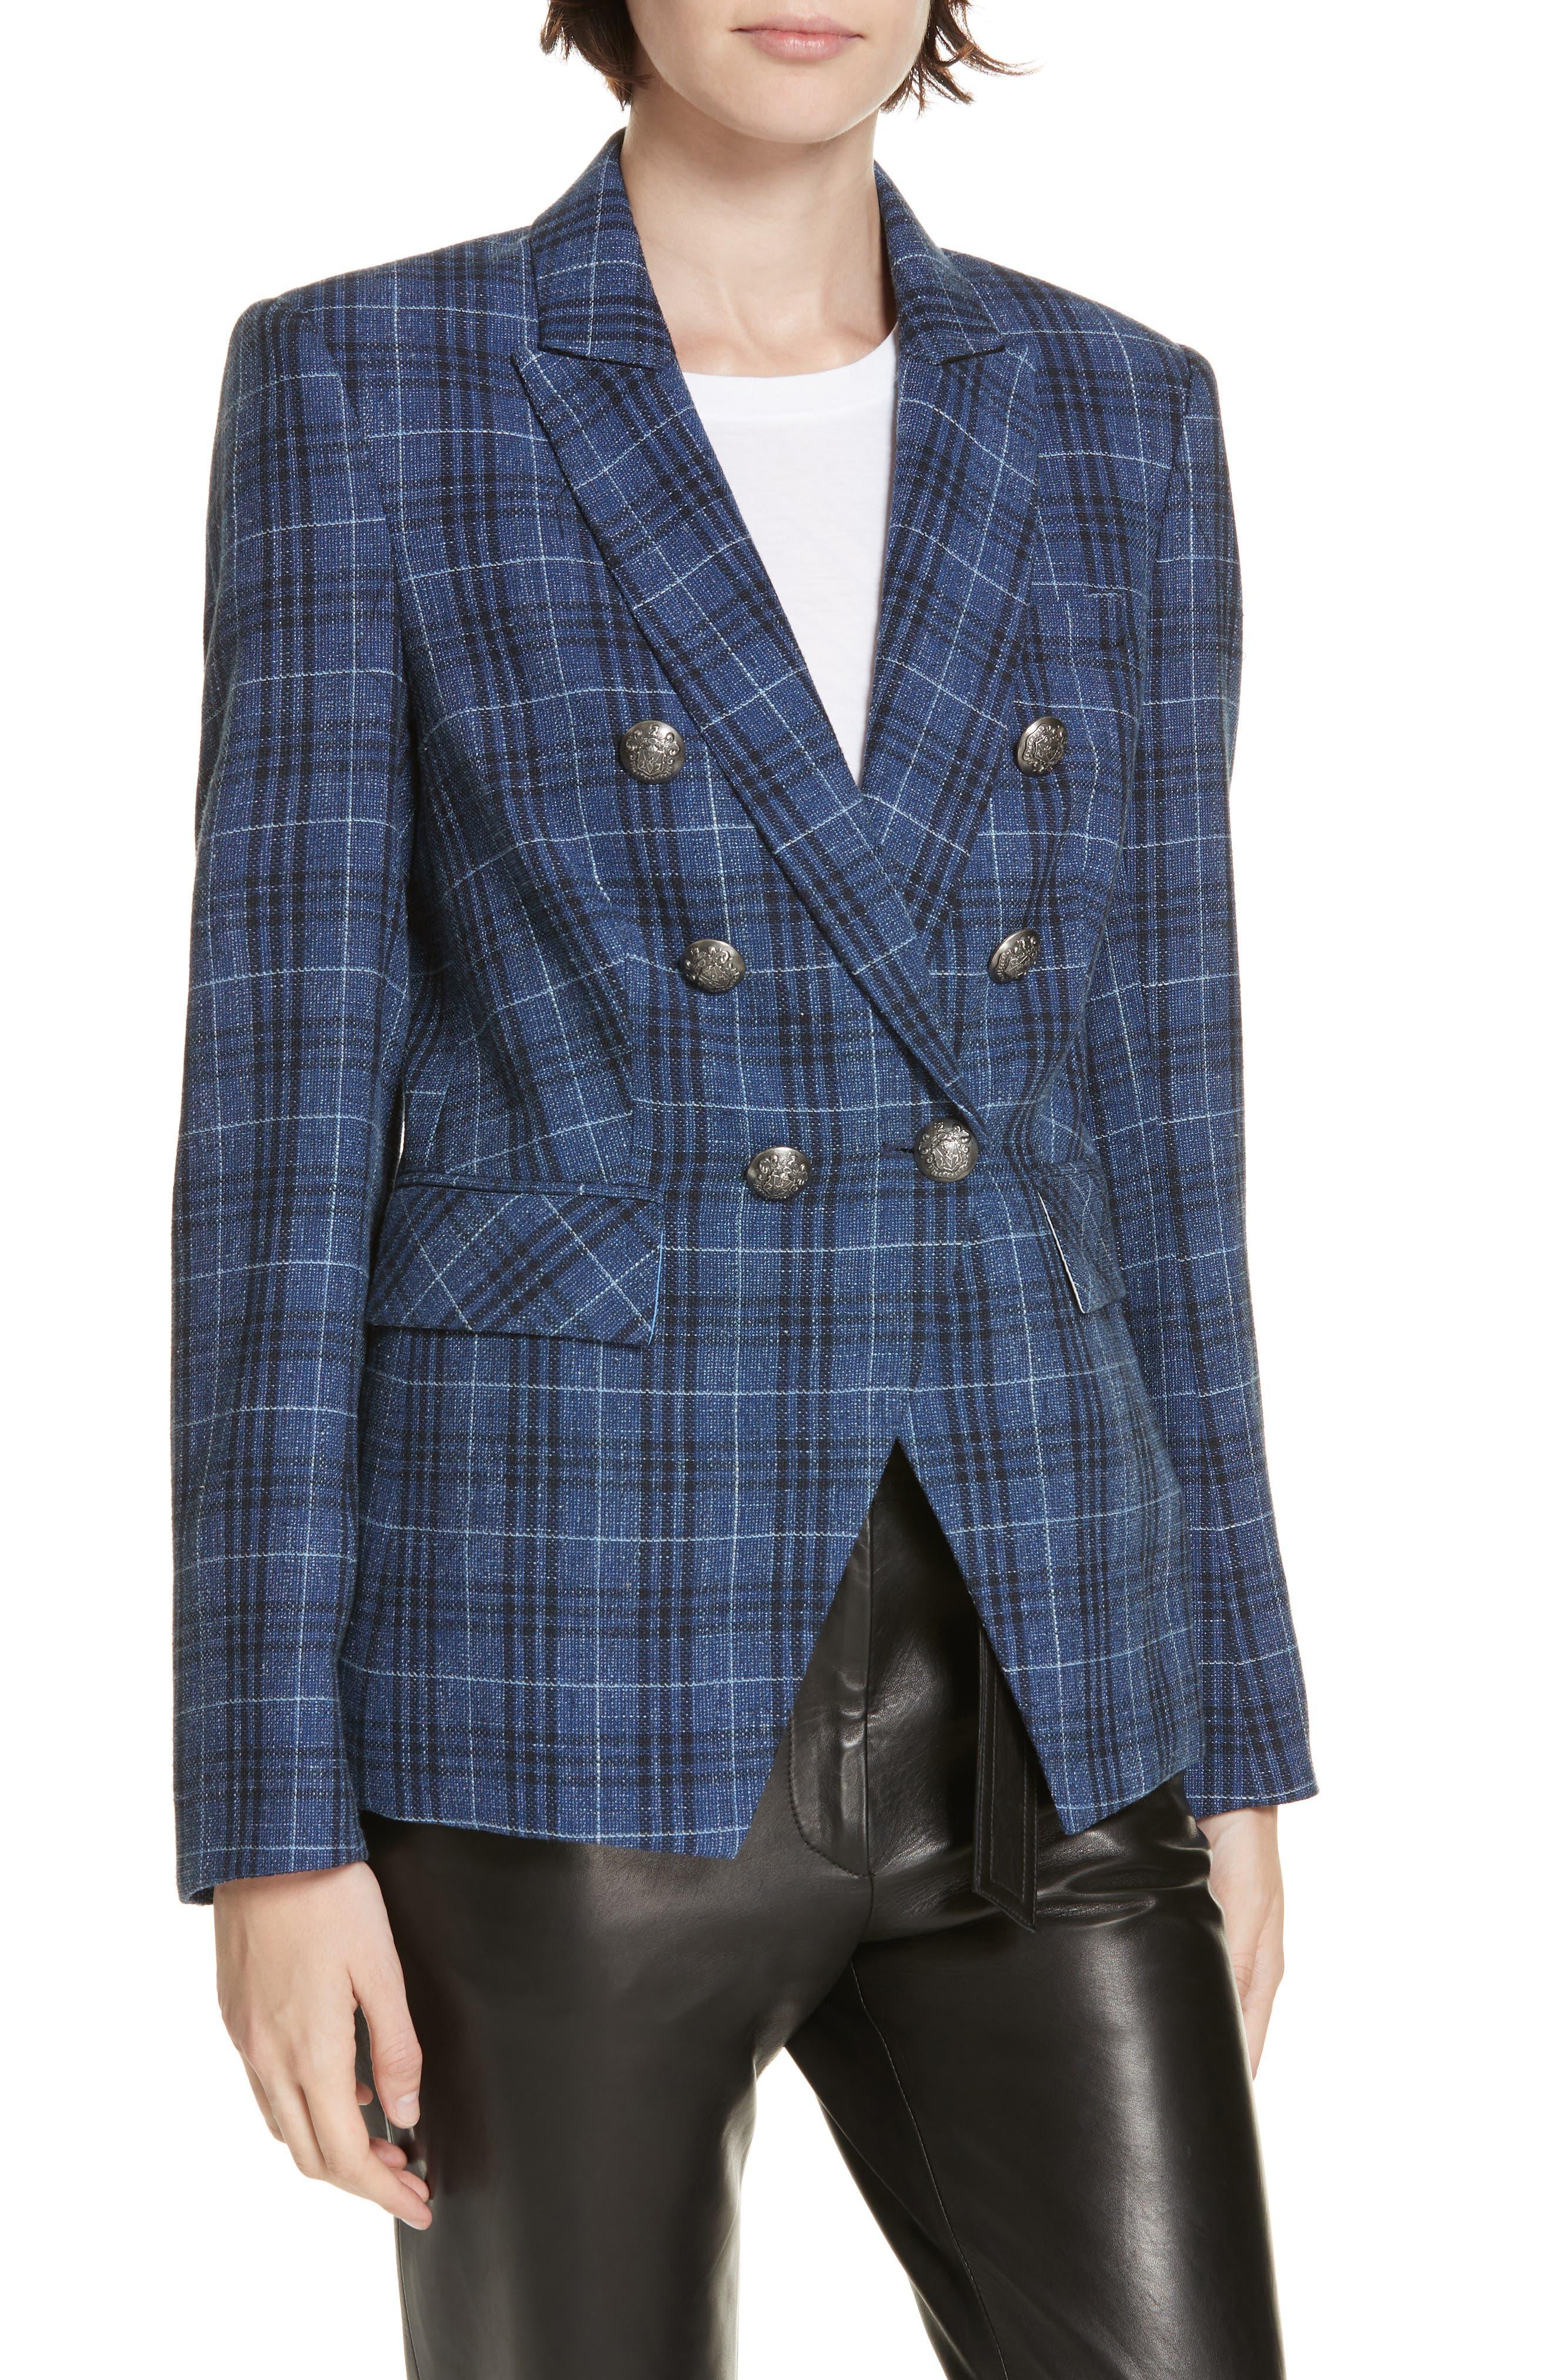 VERONICA BEARD,                             Miller Wool Blend Plaid Dickey Jacket,                             Alternate thumbnail 2, color,                             BLUE